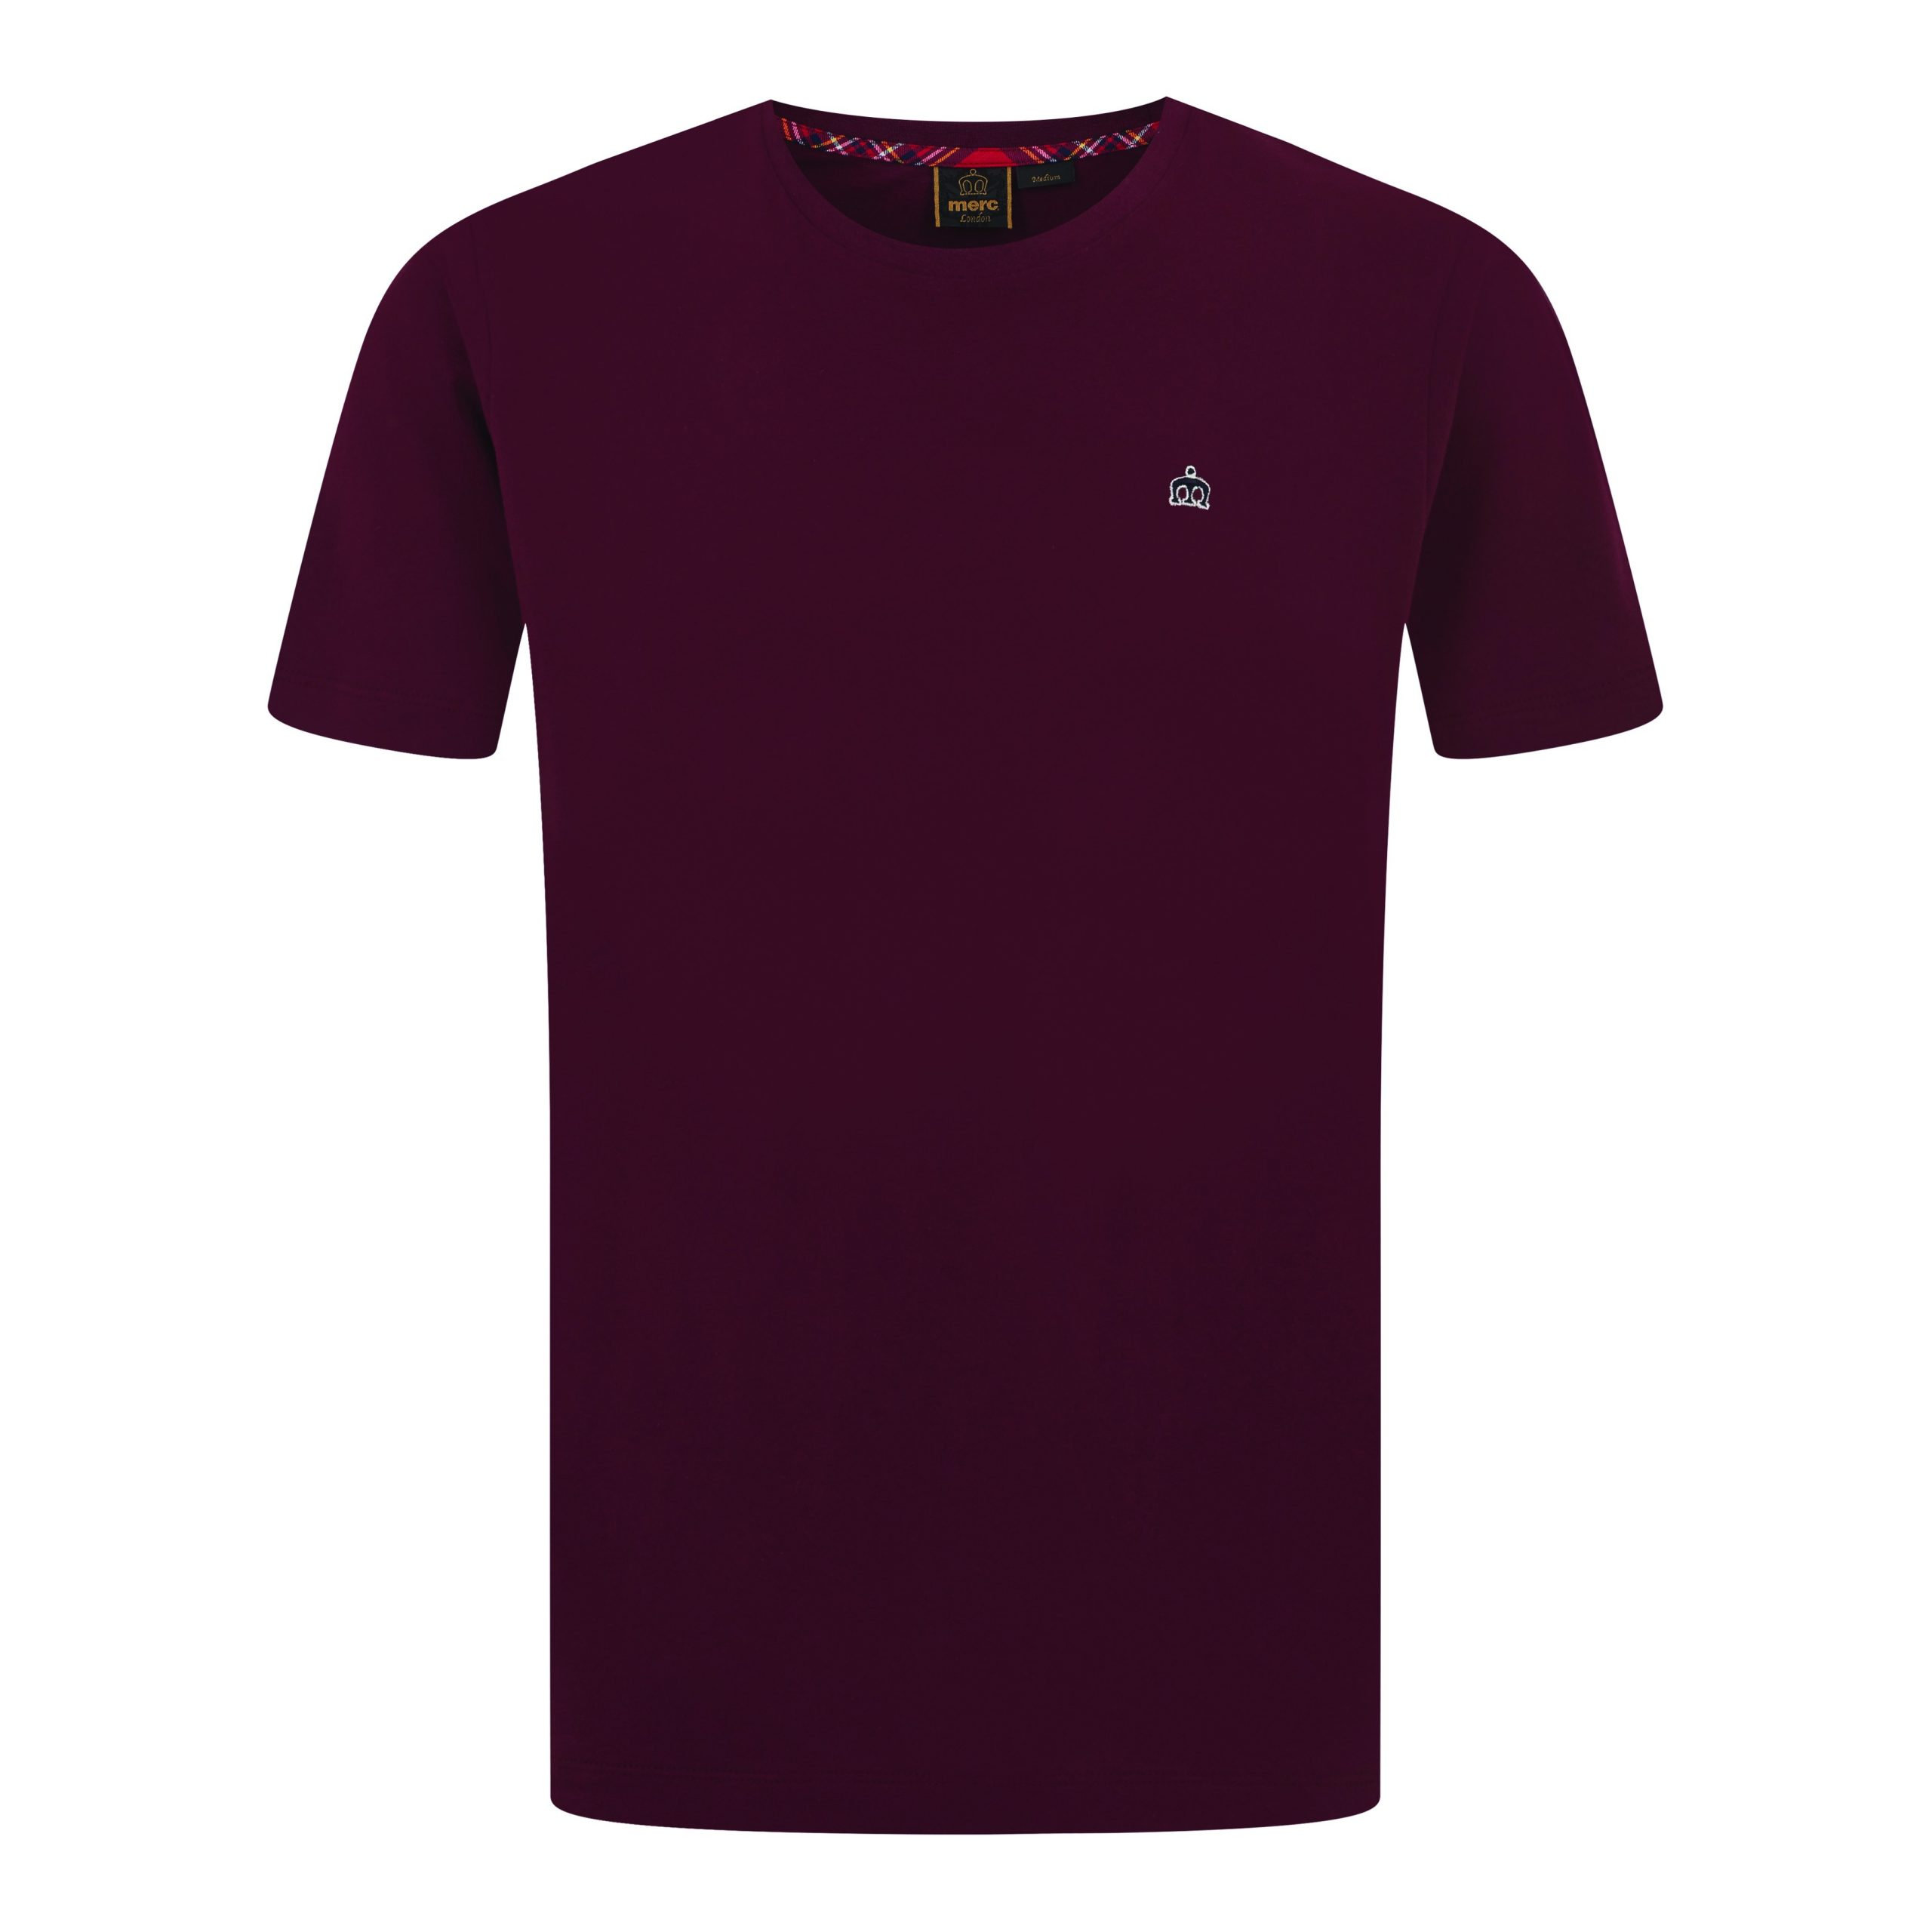 Koszulka MERC LONDON KEYPORT T SHIRT, bordowa